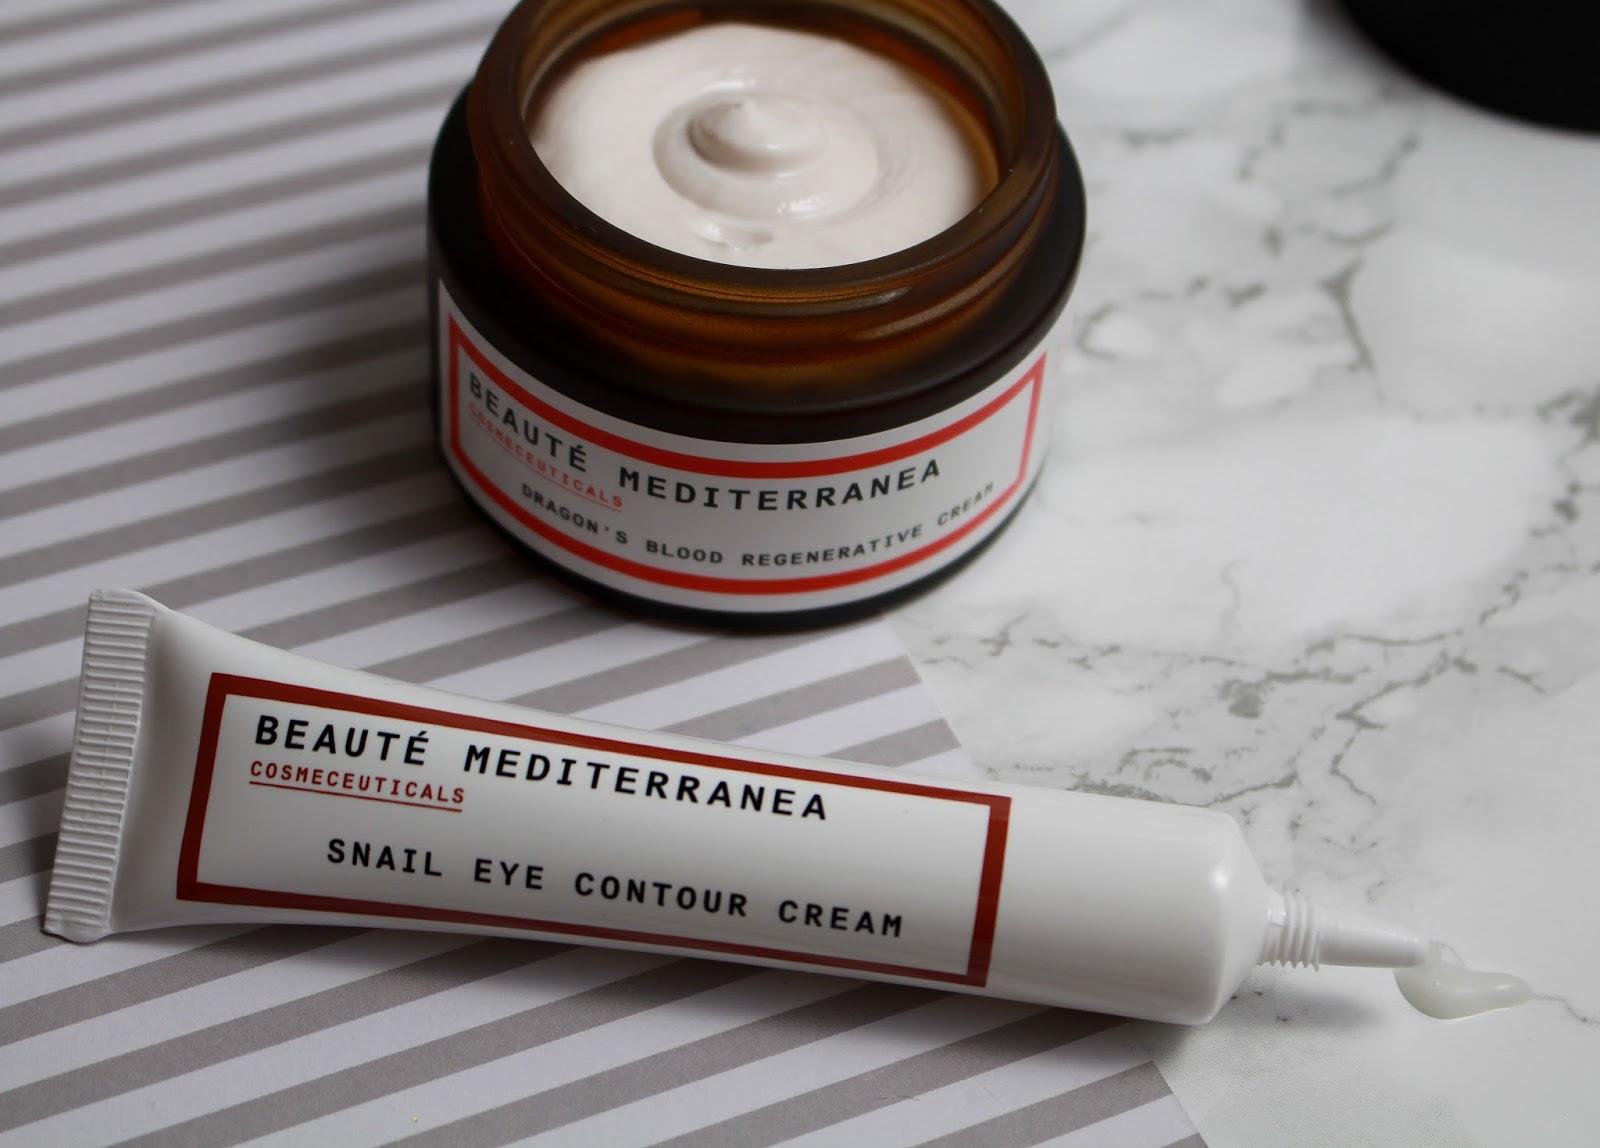 Mitonia Beaute Mediterranea, Mitonia Review, Mitonia MEDITERRANEA SNAIL EYE CONTOUR CREAM, BEAUTÉ MEDITERRANEA DRAGON'S BLOOD REGENERATIVE CREAM, Blogger mail